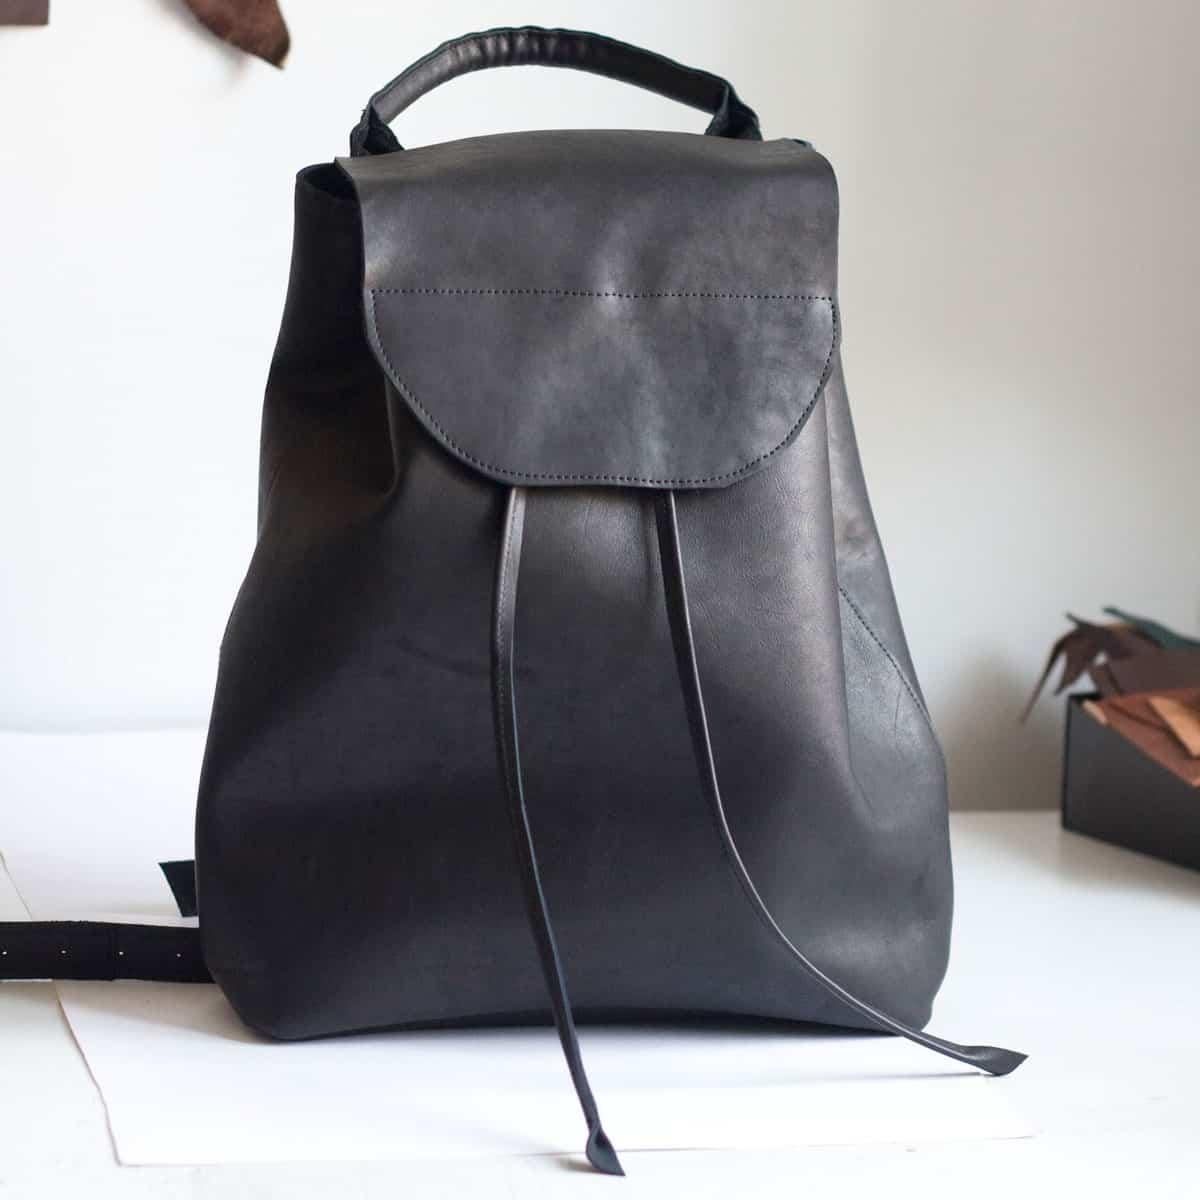 czarny-plecak-skora1a